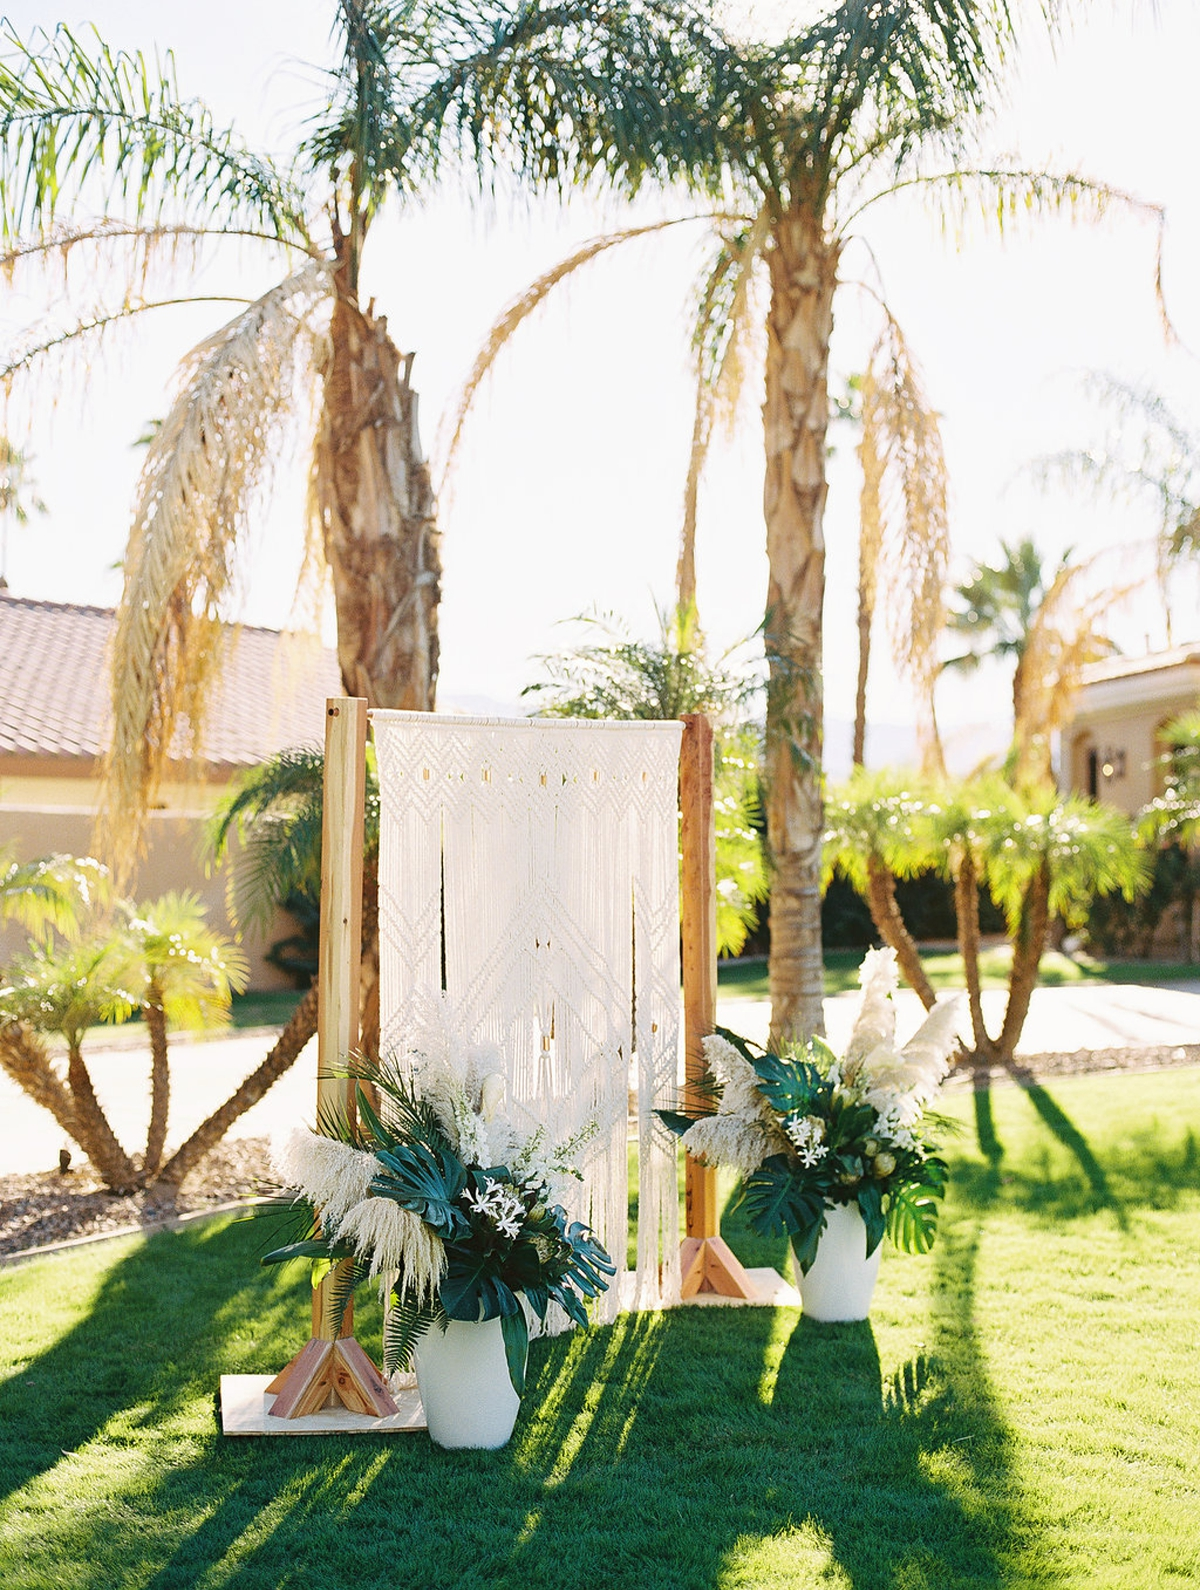 Phi and Alannas Backyard Wedding in Palm Springs California 17.jpg